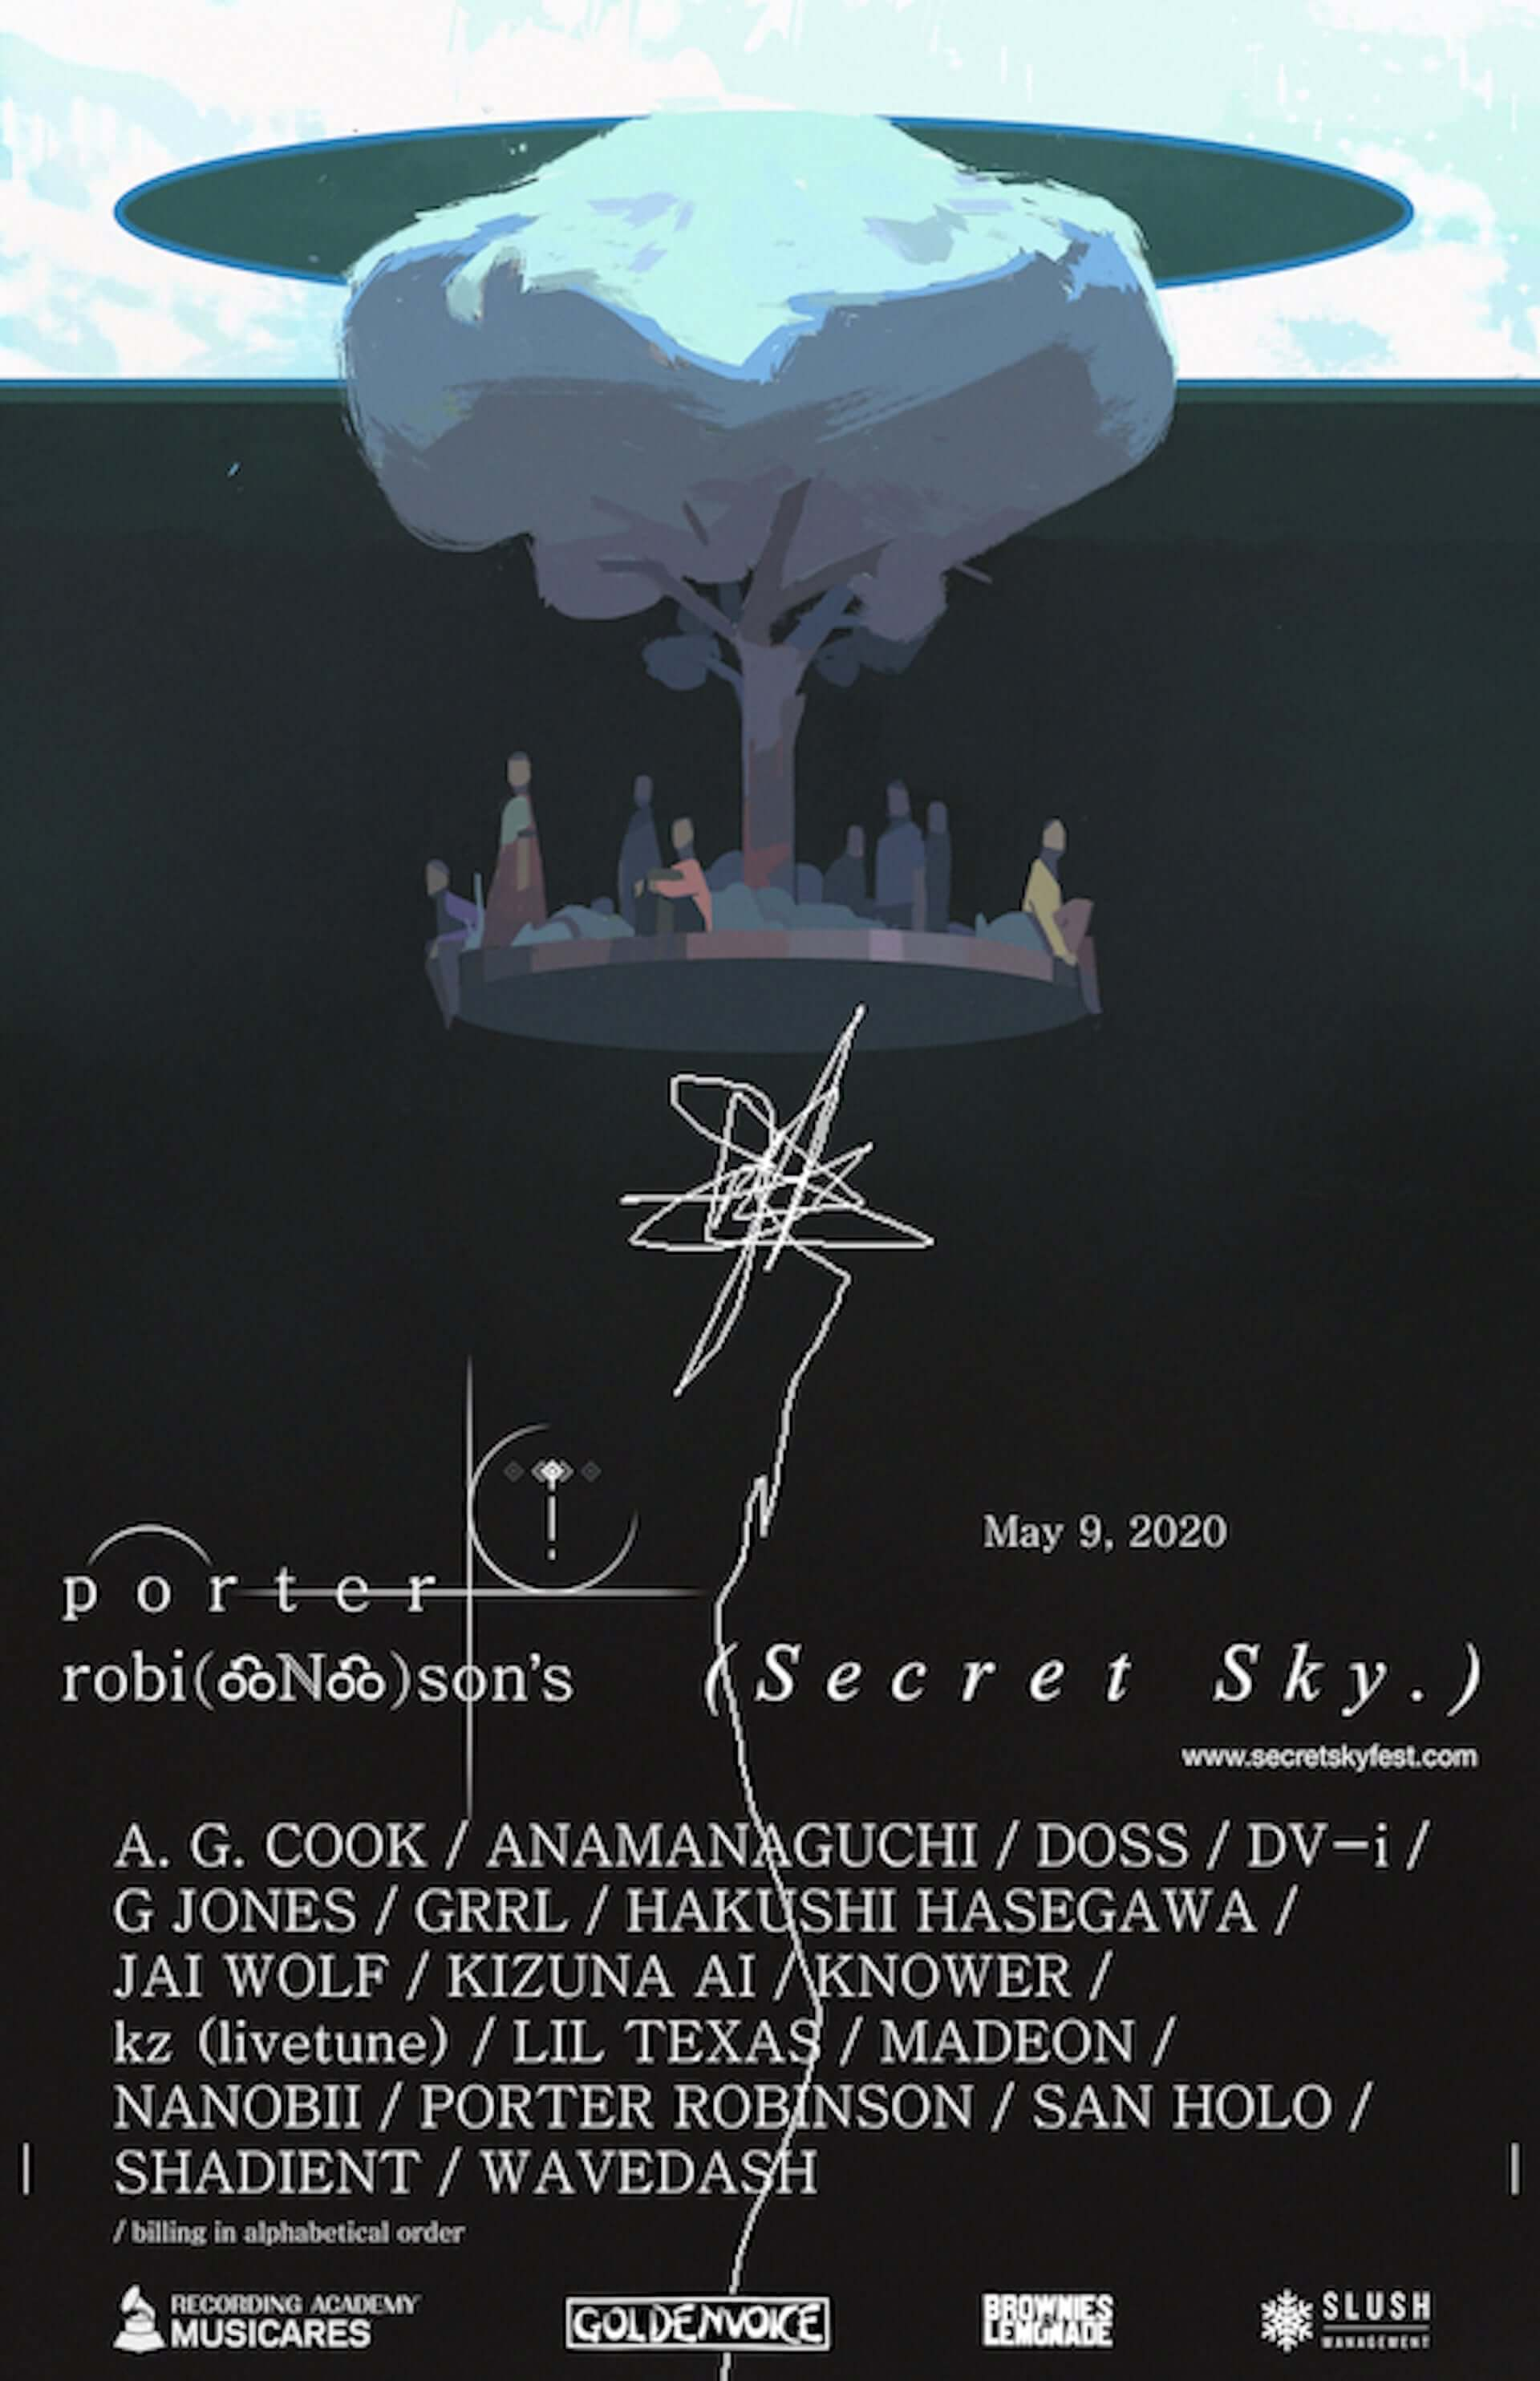 Porter Robinson主催オンラインフェス<SECRET SKY MUSIC FESTIVAL>に長谷川白紙が出演決定!Madeon、キズナアイ、kz(livetune)もラインナップ music200507_hasegawahakushi_1-1920x2968